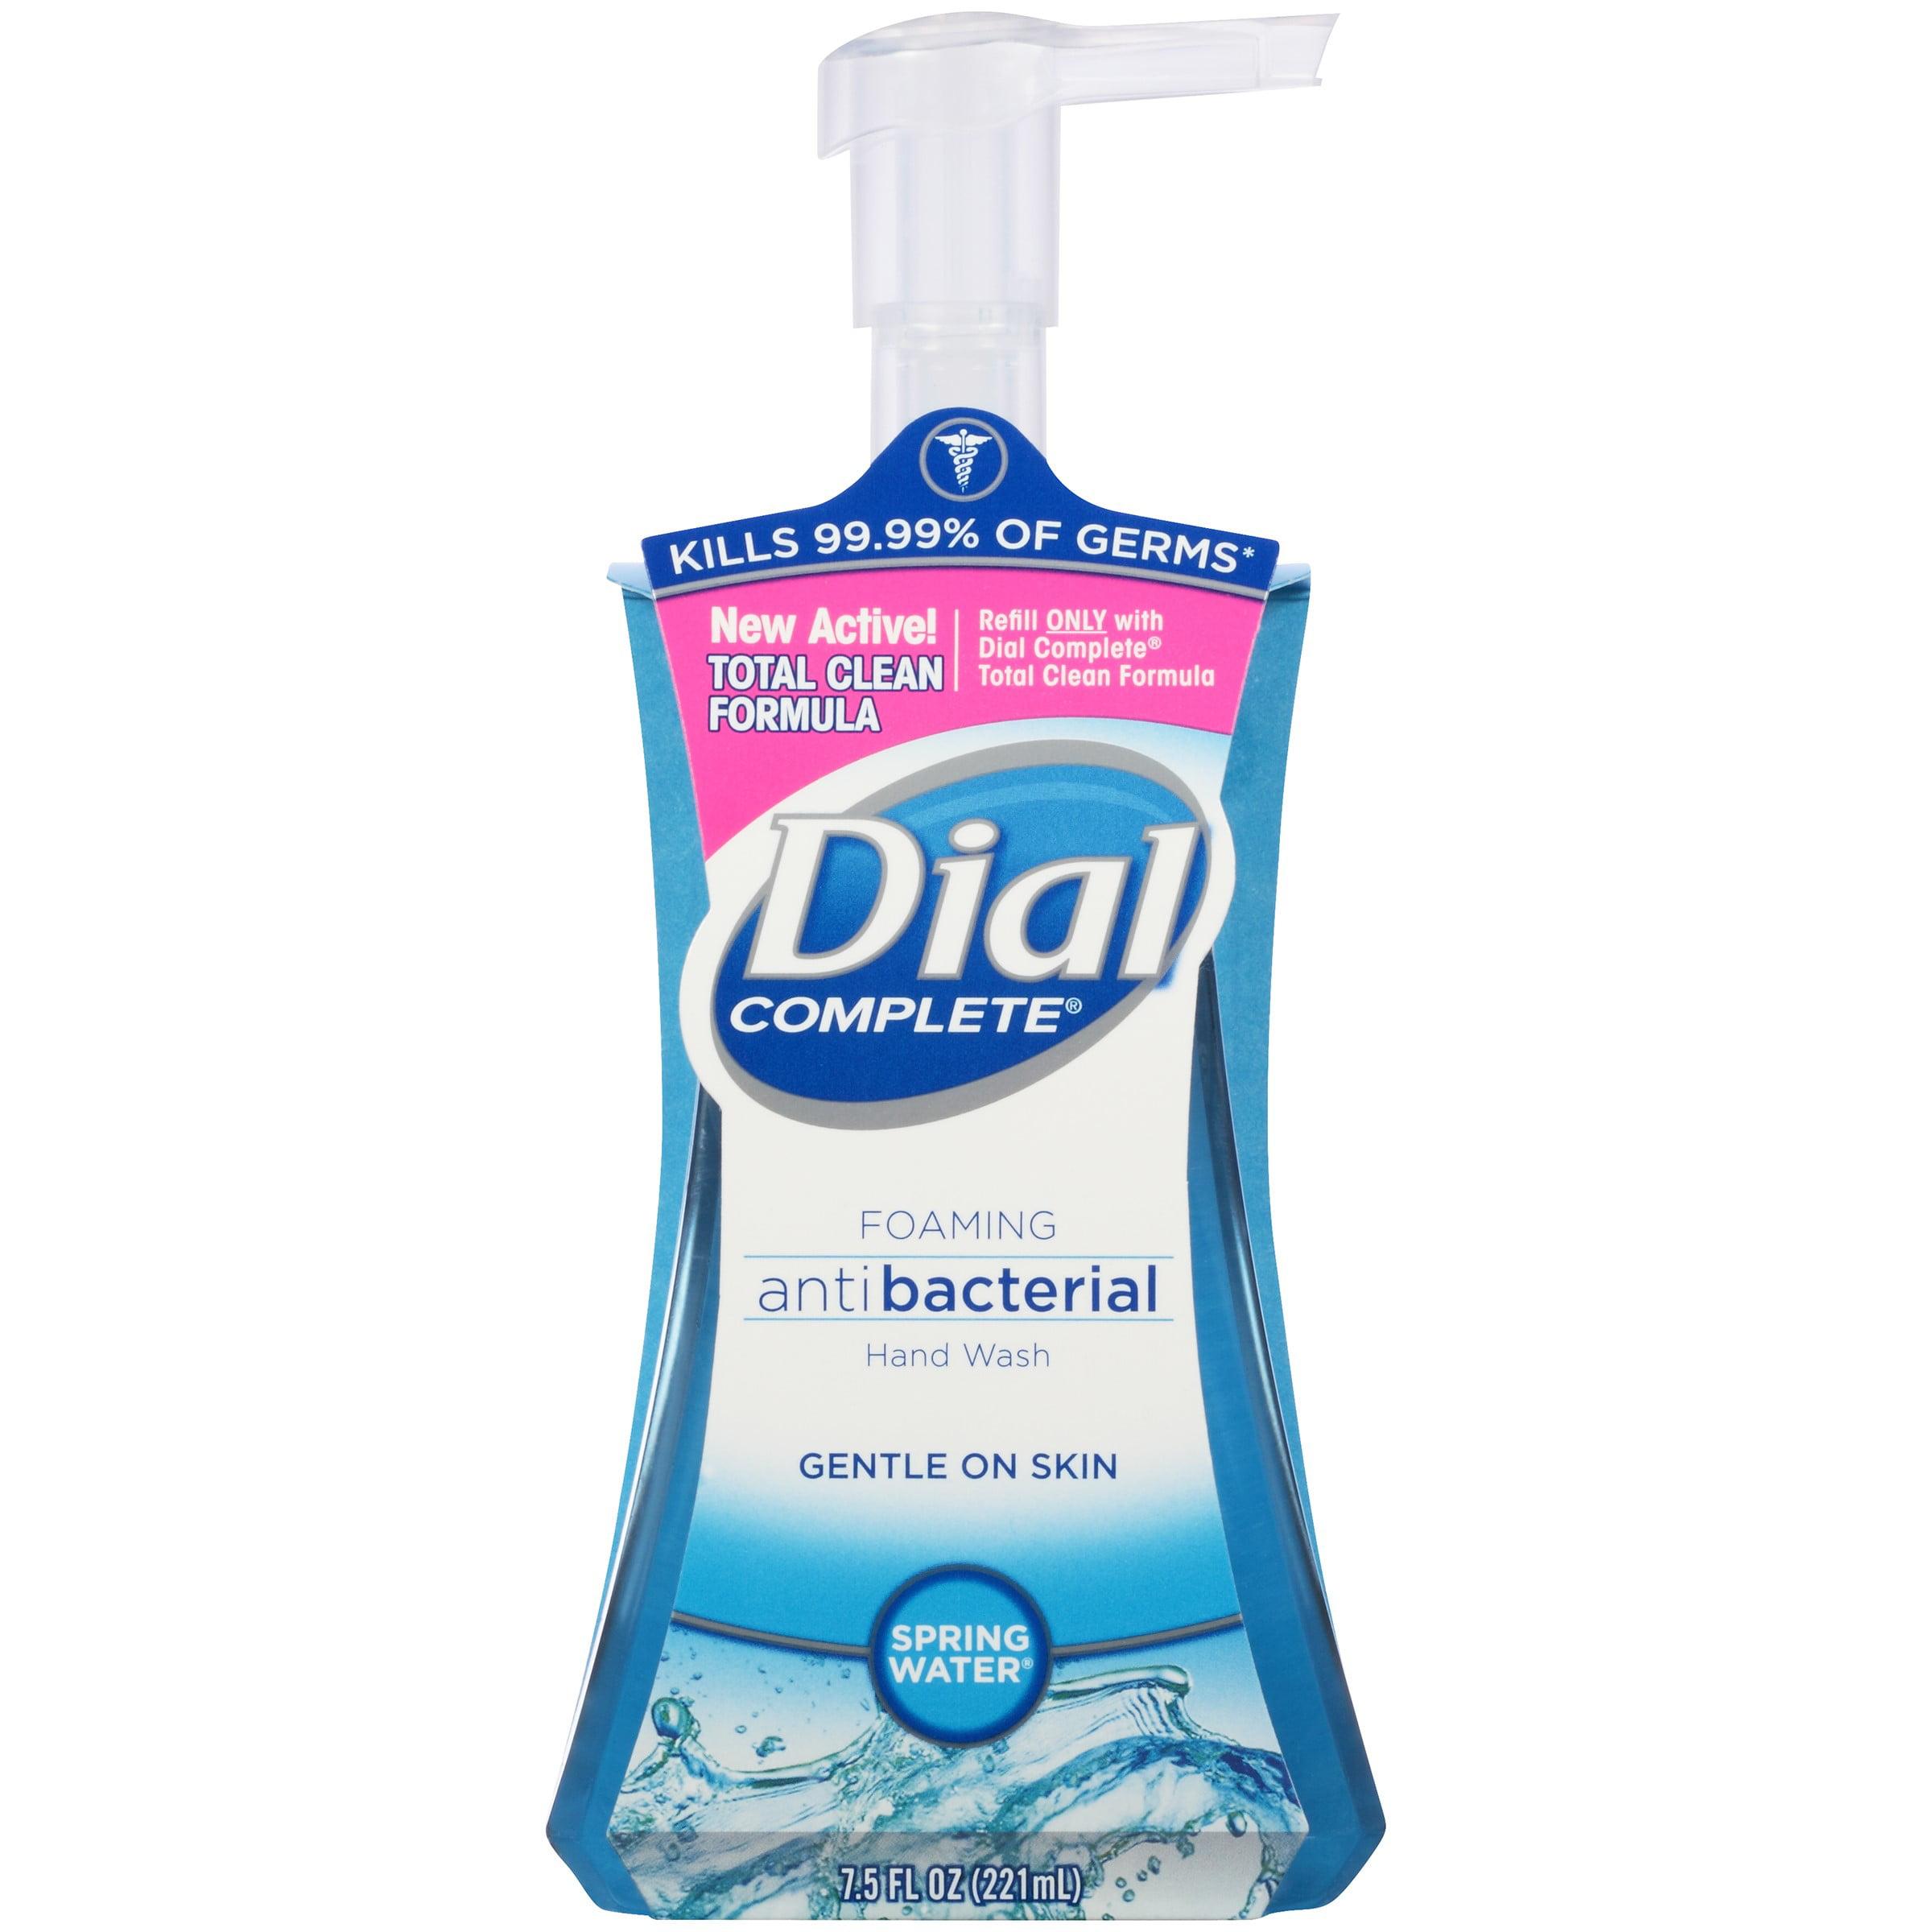 Dial Complete Foaming Antibacterial Hand Soap, Springwater, 7.5 Oz